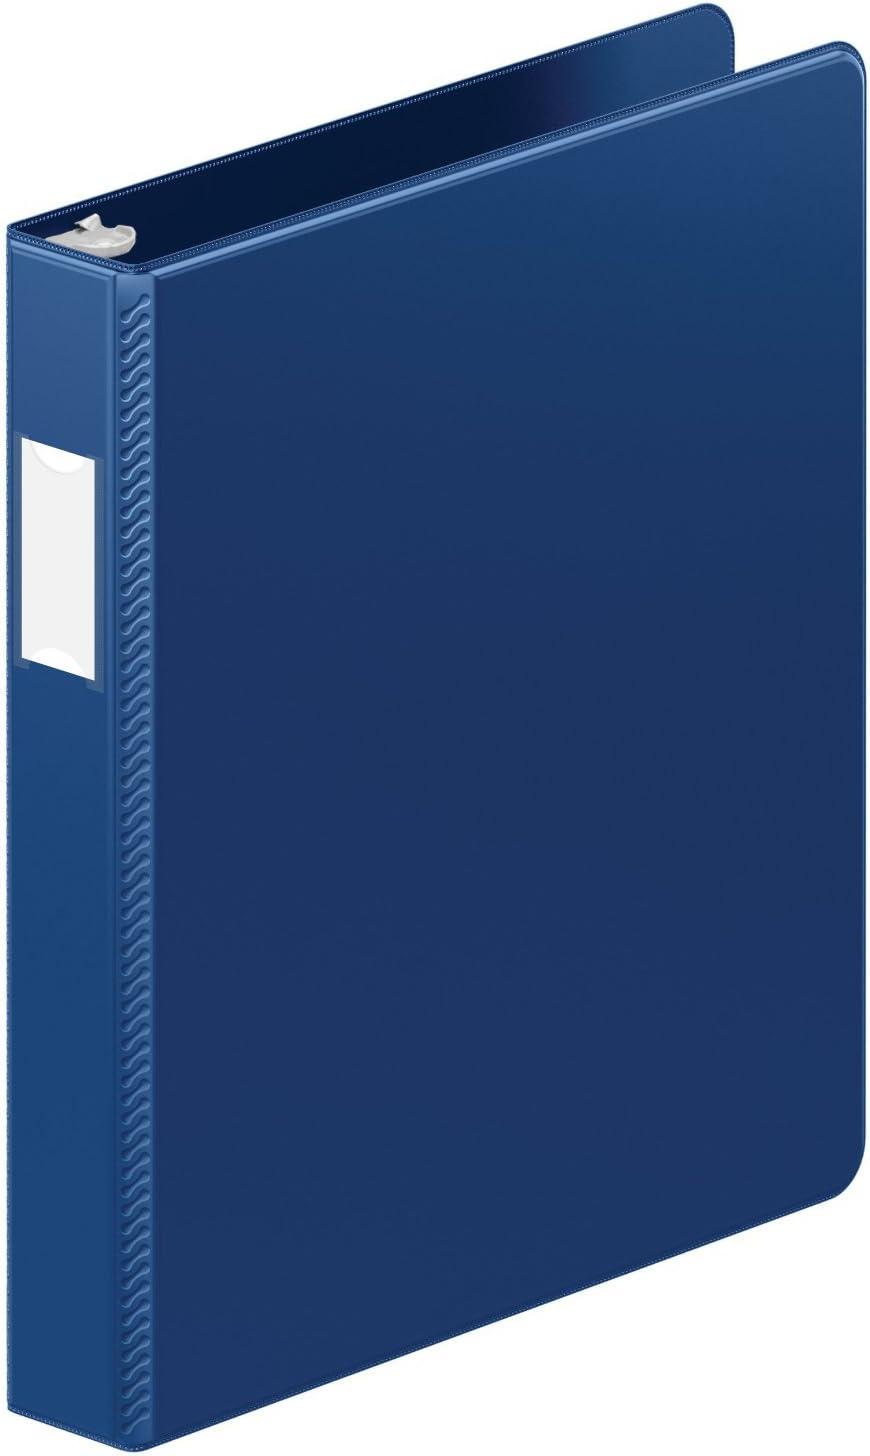 Letter Size 175-Sheet Capacity 5050513561 Wilson Jones ENVI Heavy Duty 1-Inch Round Ring Binder Burgundy